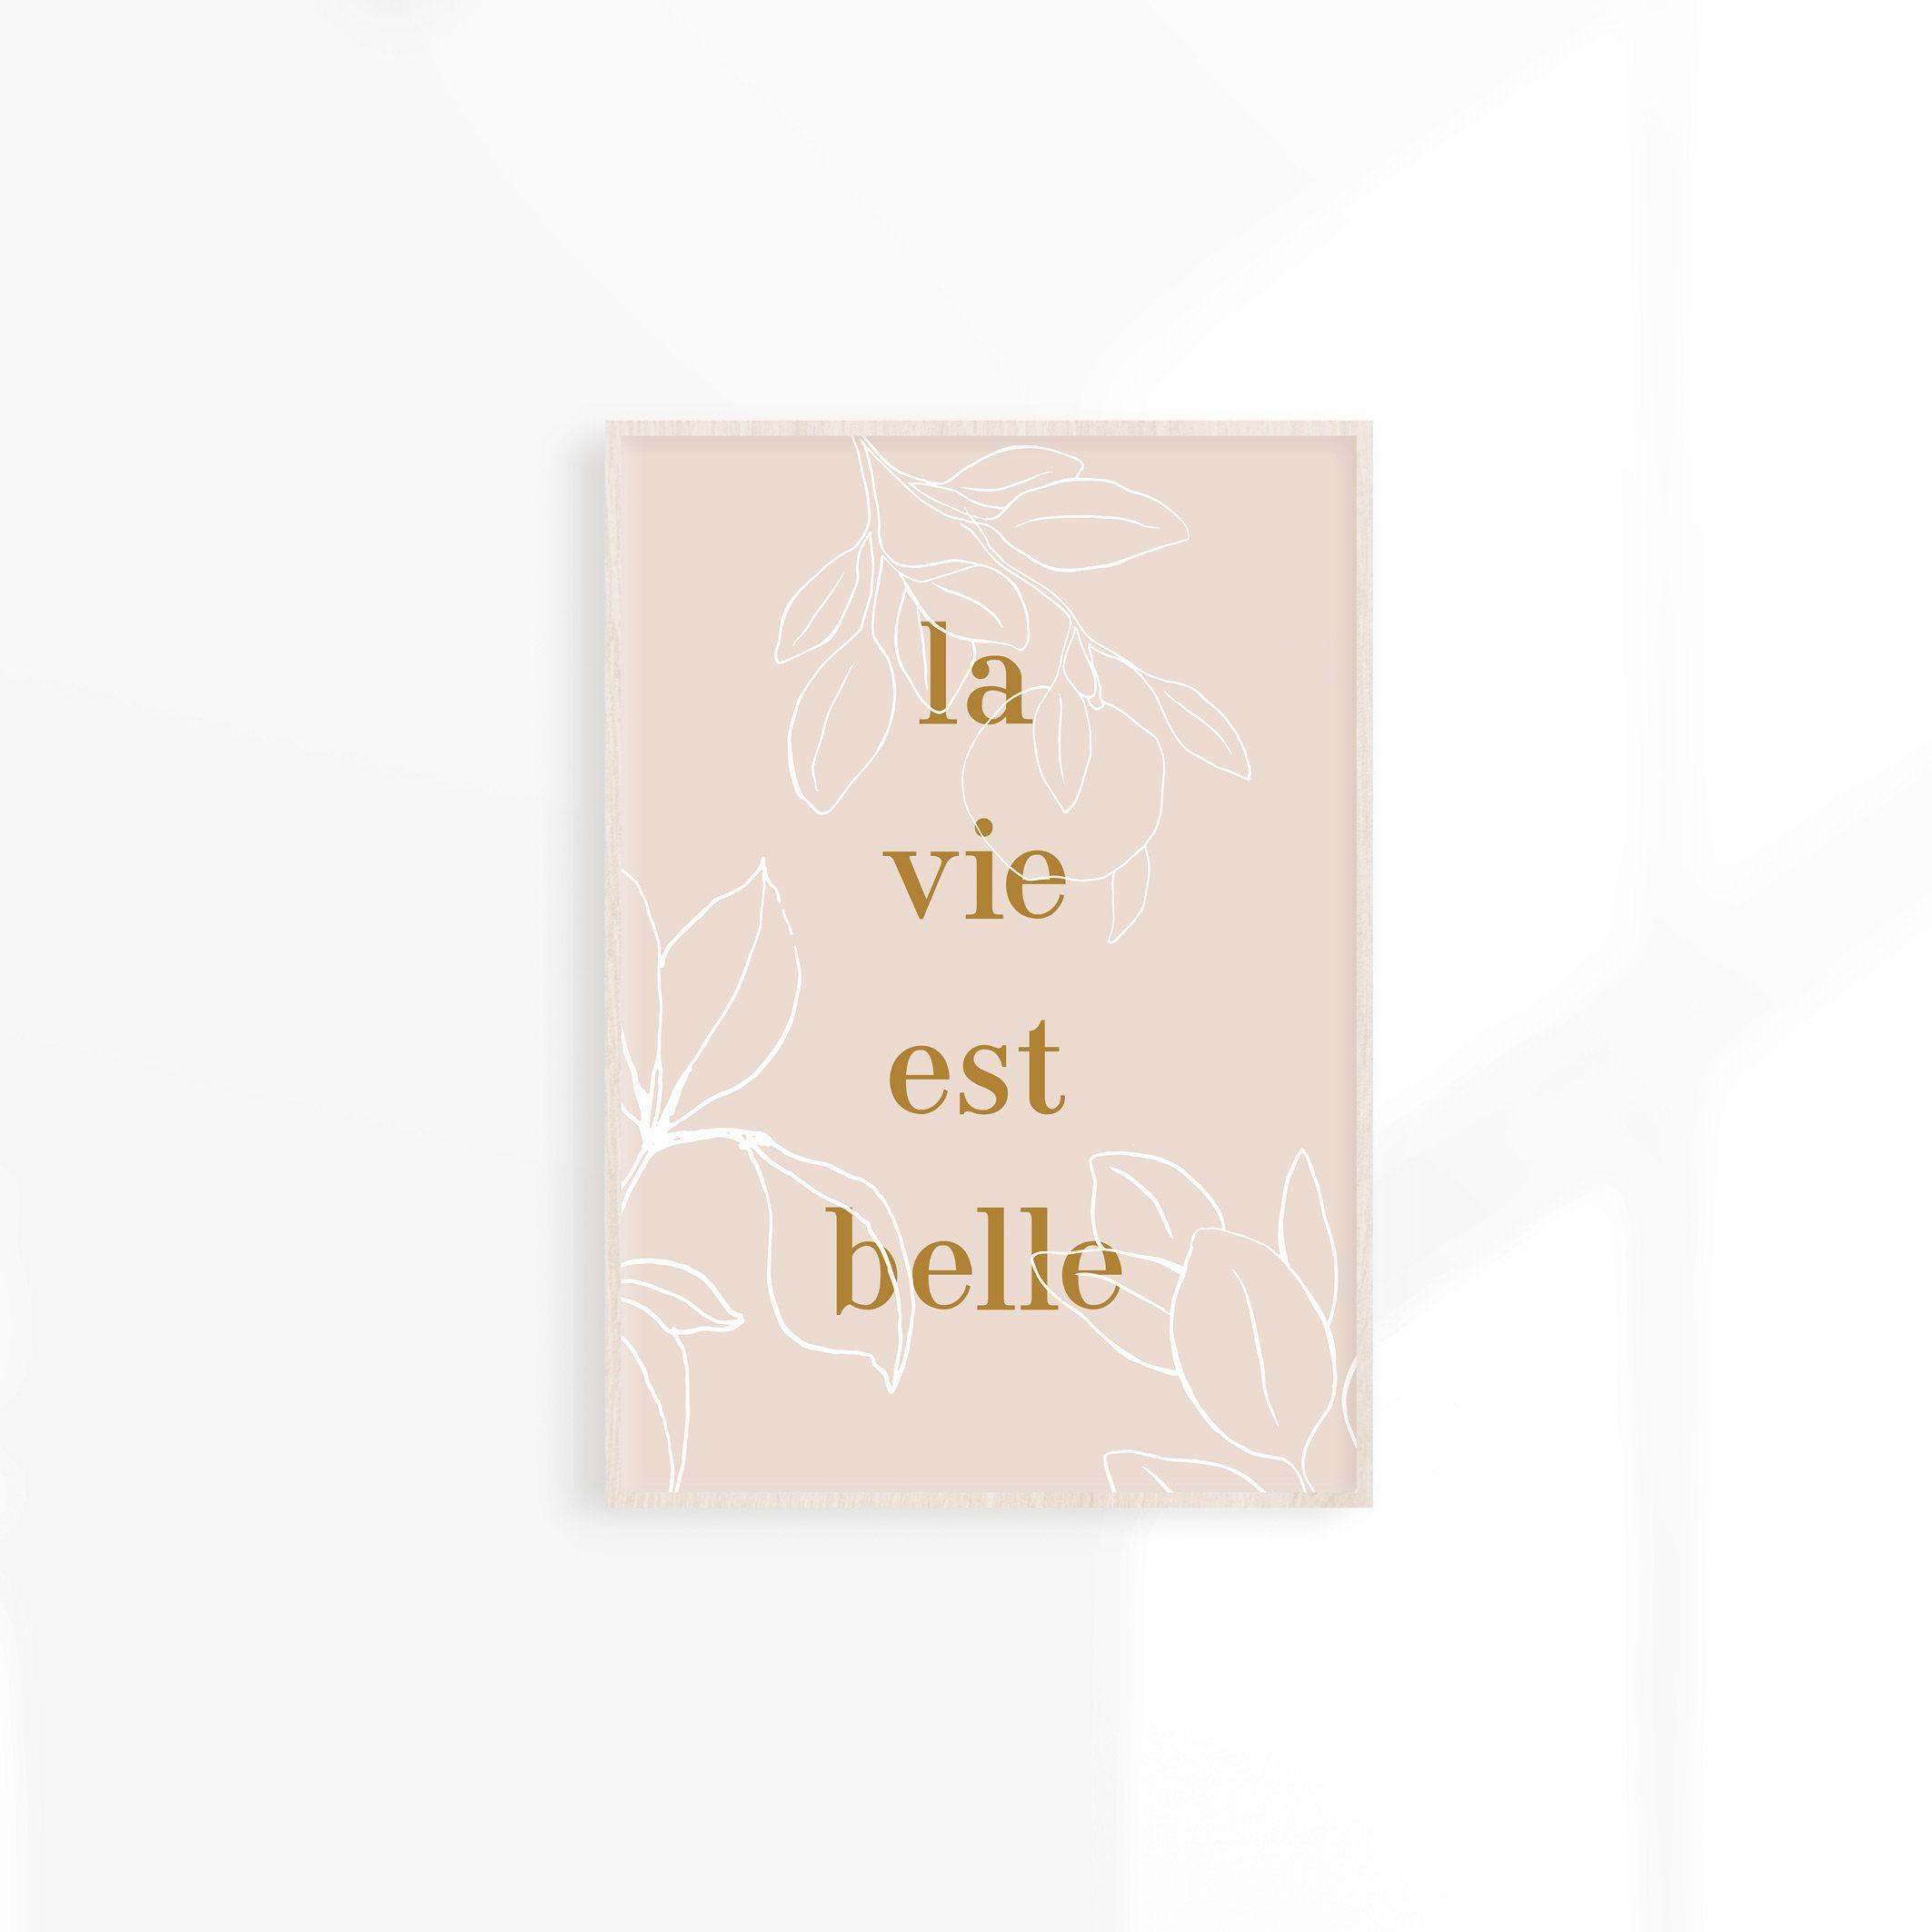 La Vie Est Belle Art Printable Life Is Beautiful Print Boho Wall Decor Flower Illustration Feminine Wall Art Neutral Wall Decor Feminine Wall Art Boho Wall Decor Neutral Wall Decor